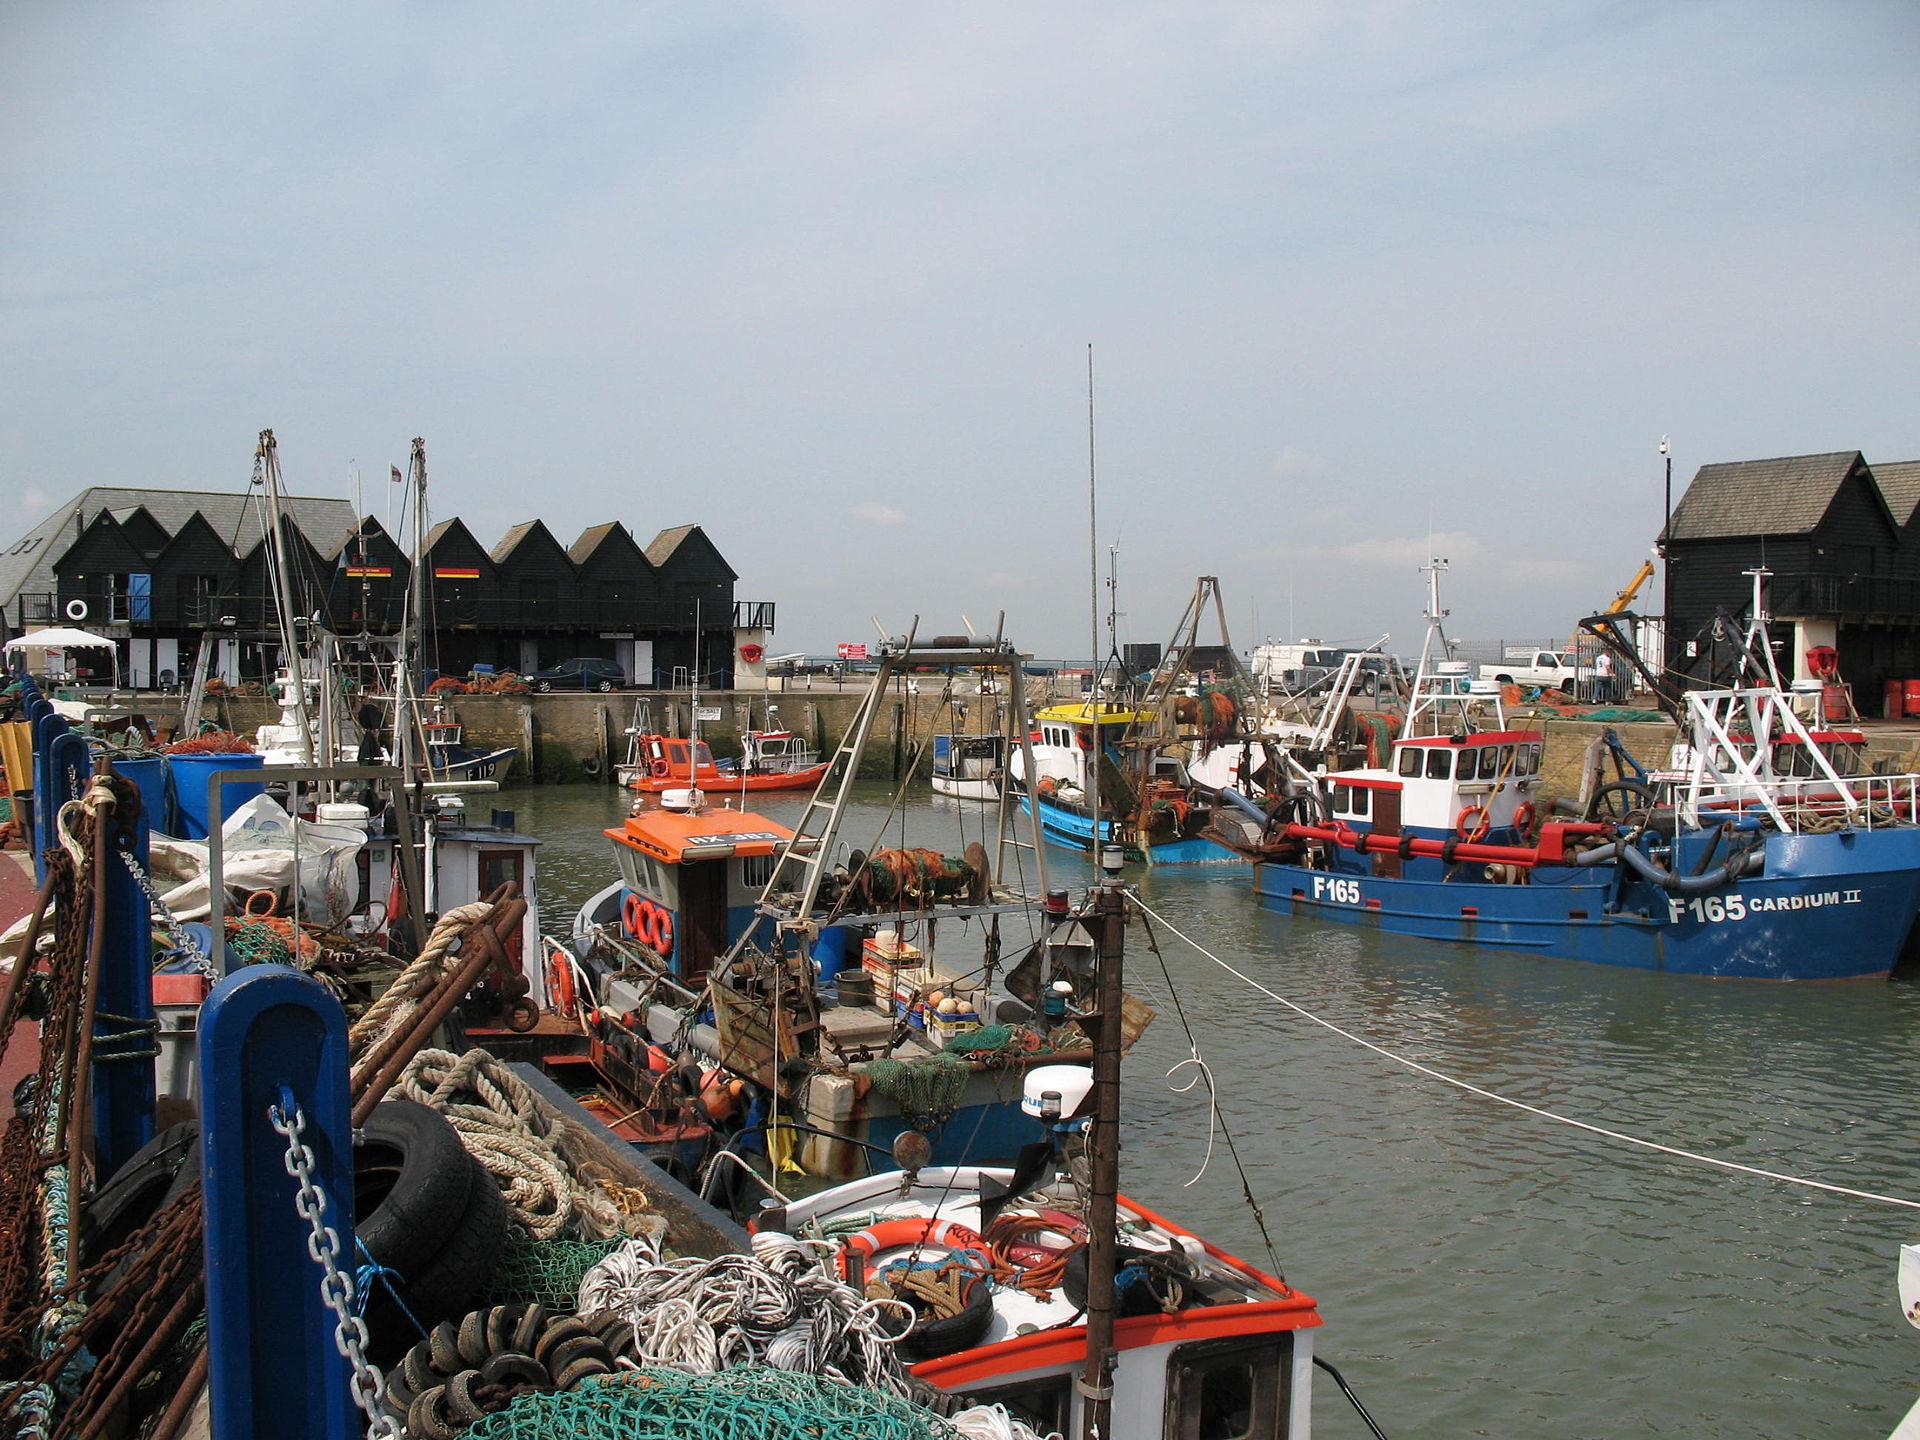 Whitstable_Harbour,_Kent,_UK